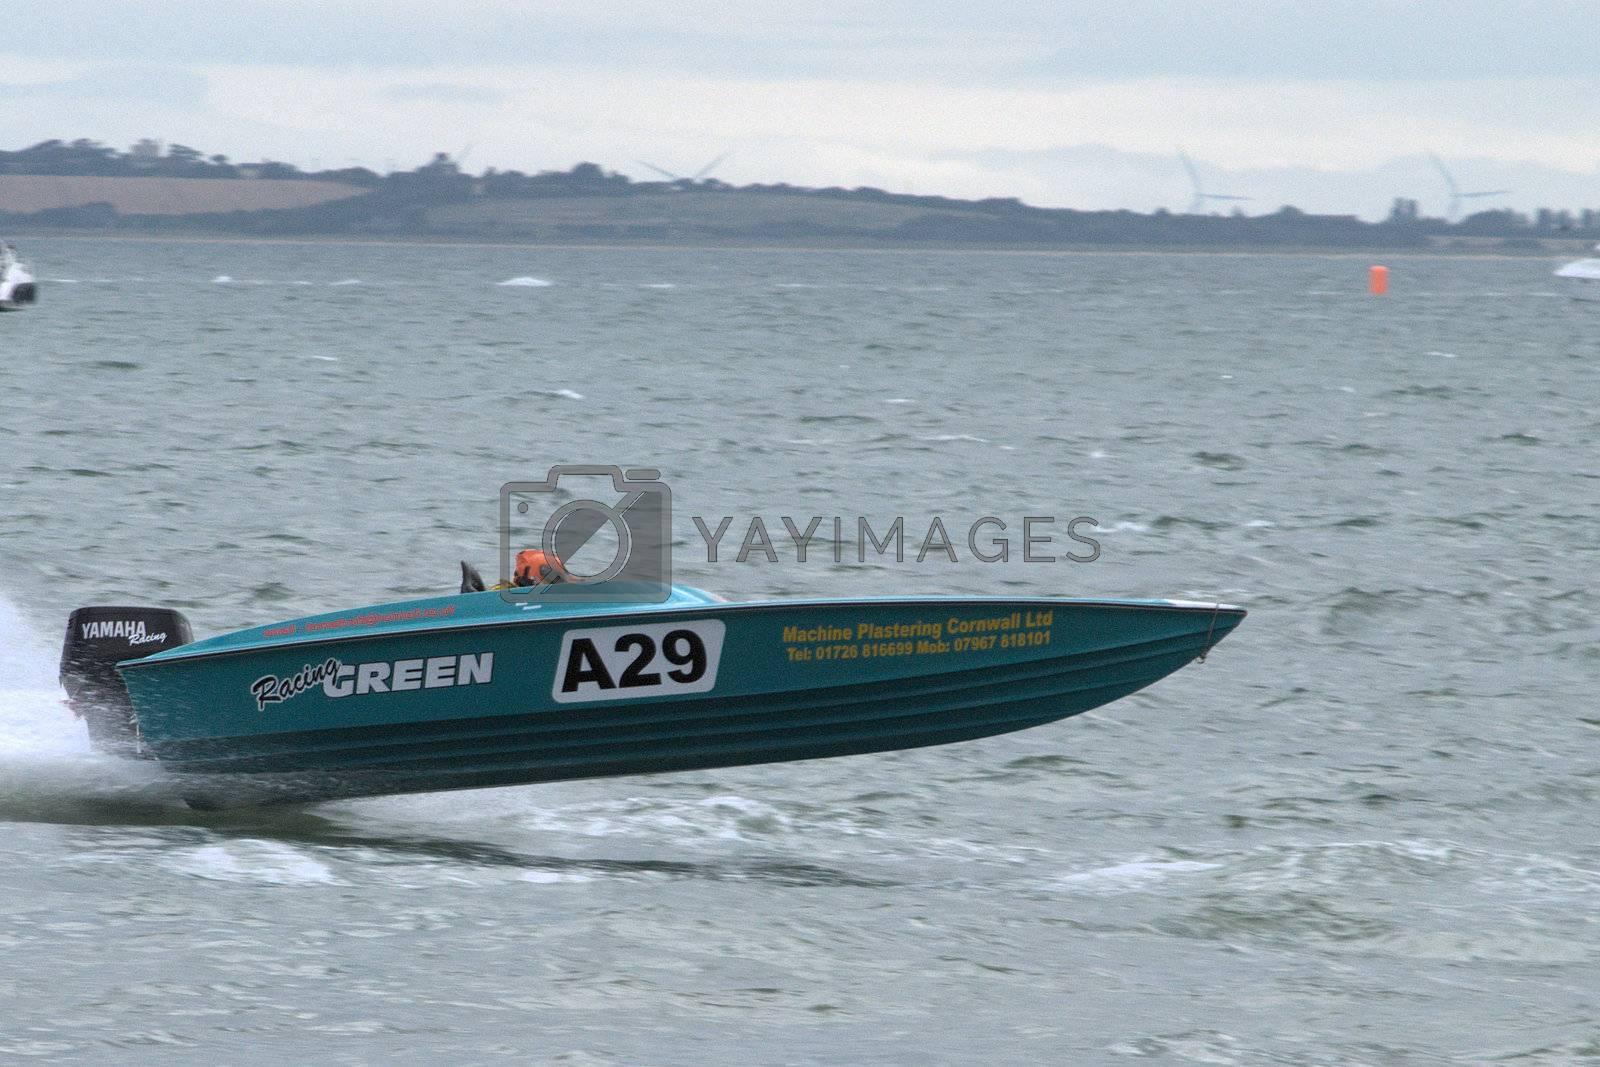 Blue power boat racing